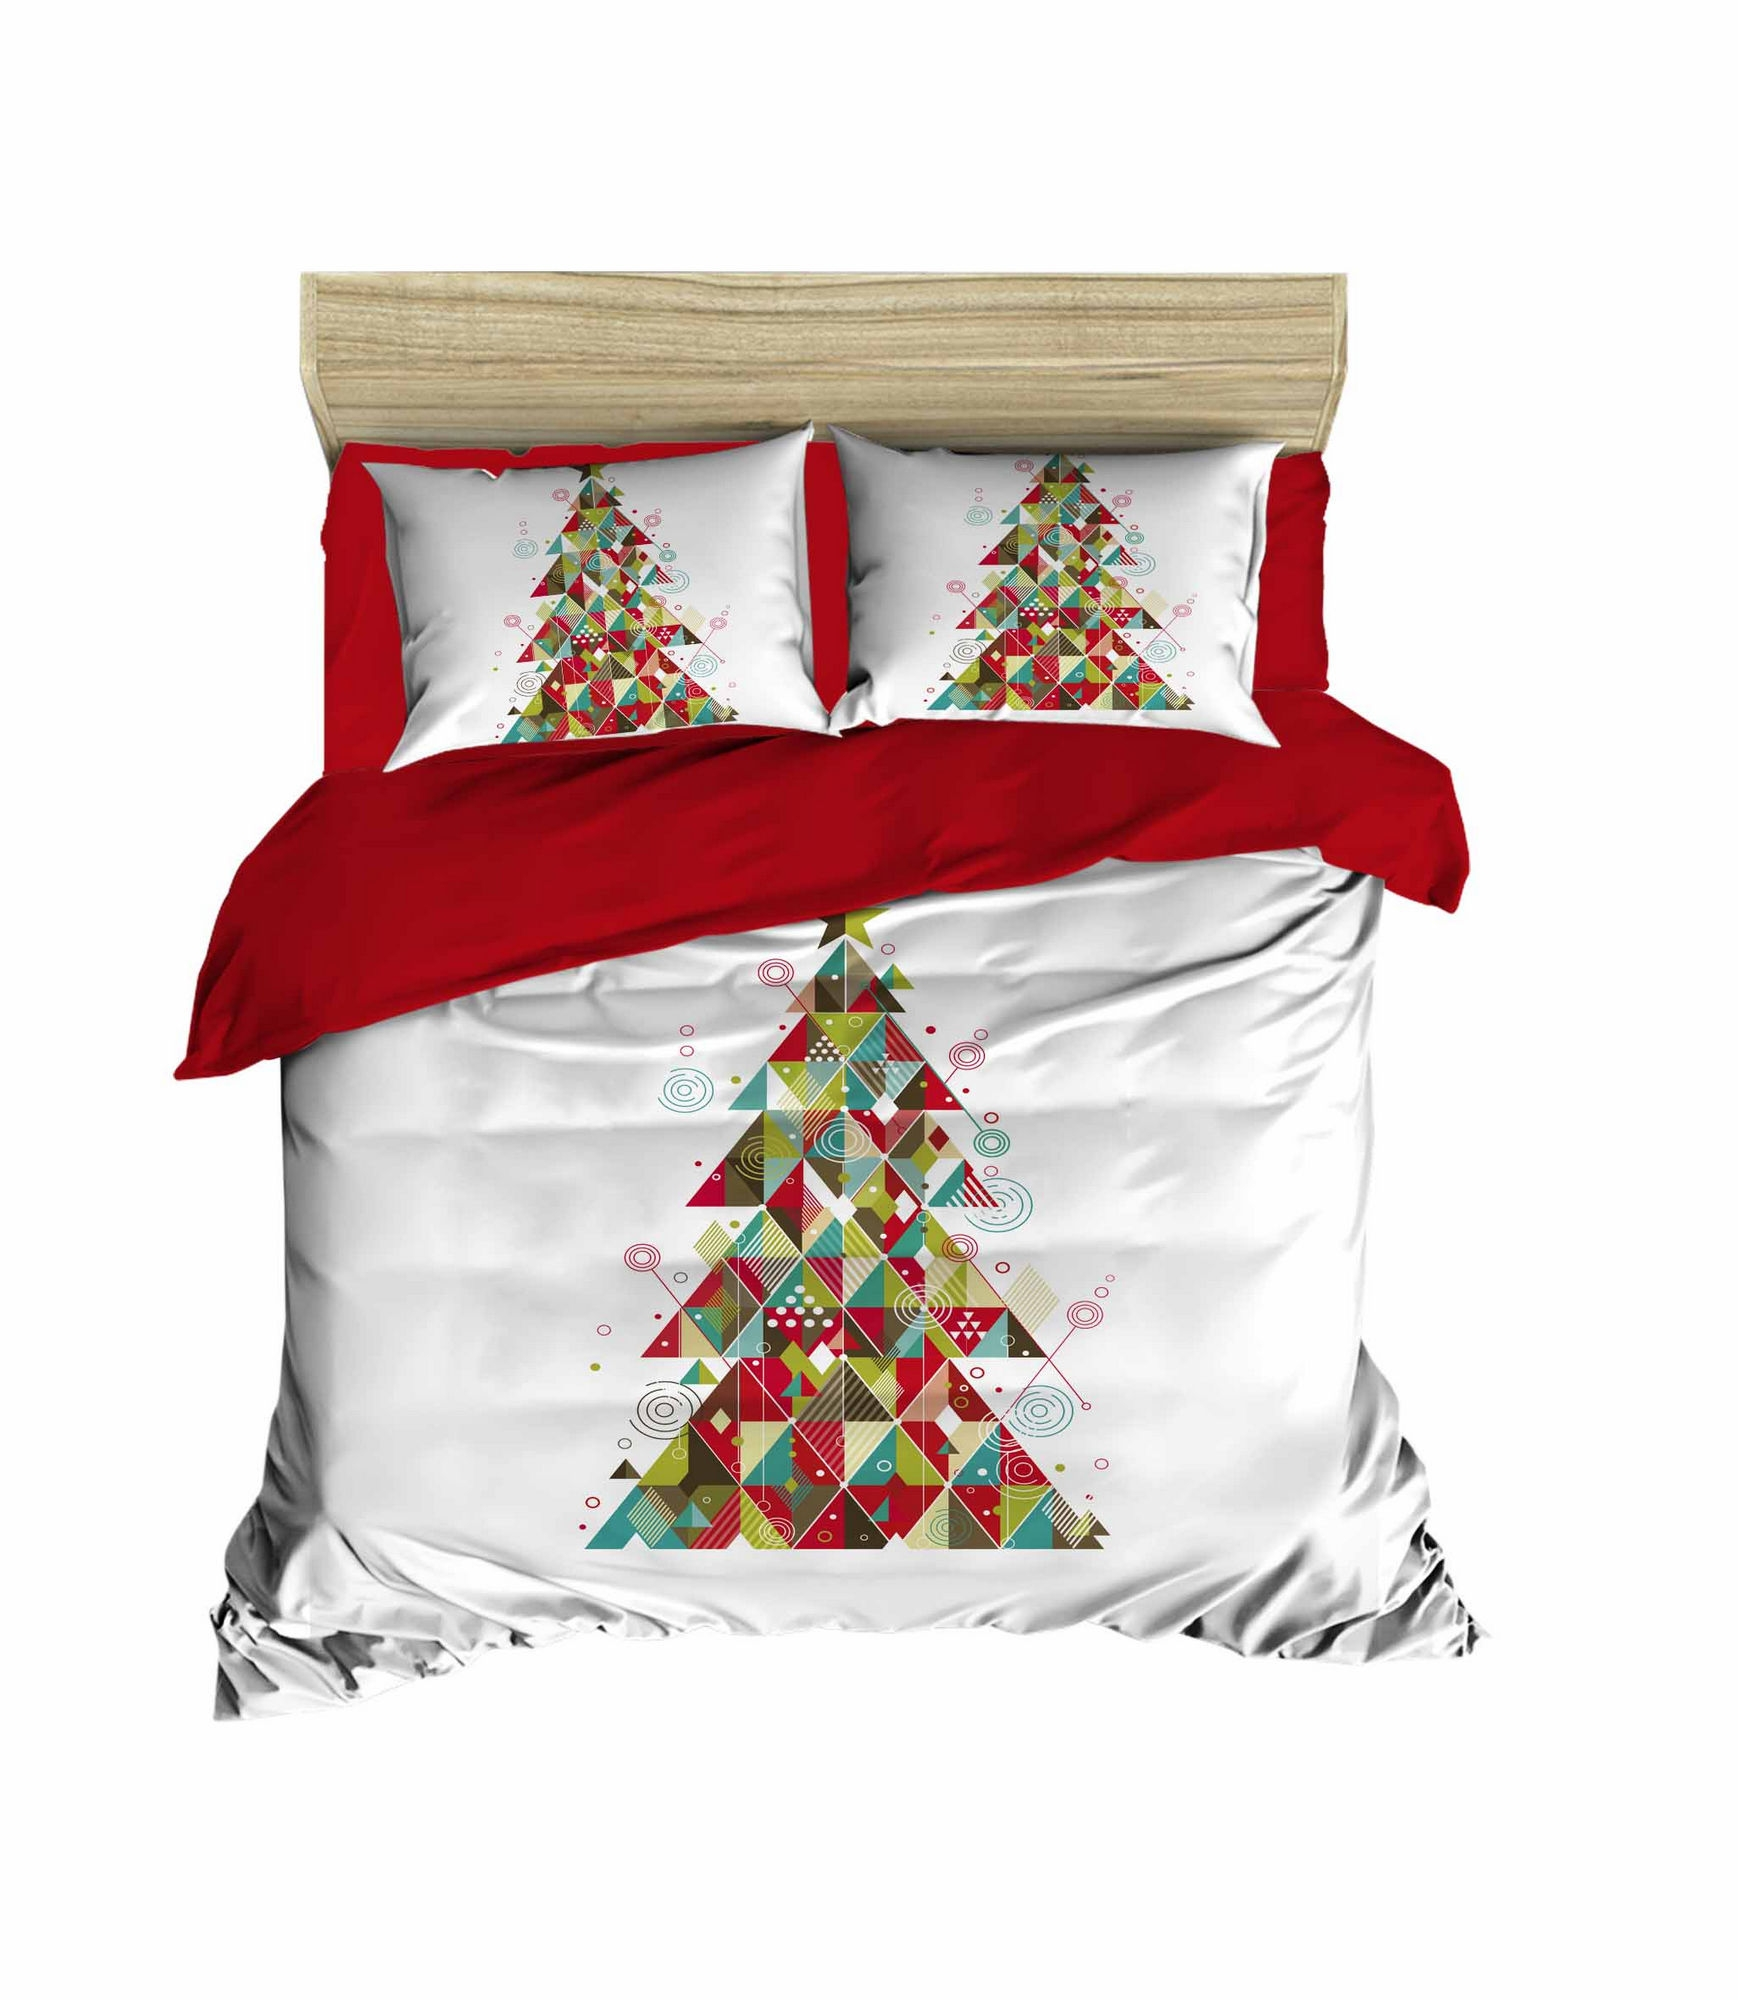 Lenjerie de pat din bumbac si microfibra Christmas 456 Multicolor, 200 x 220 cm